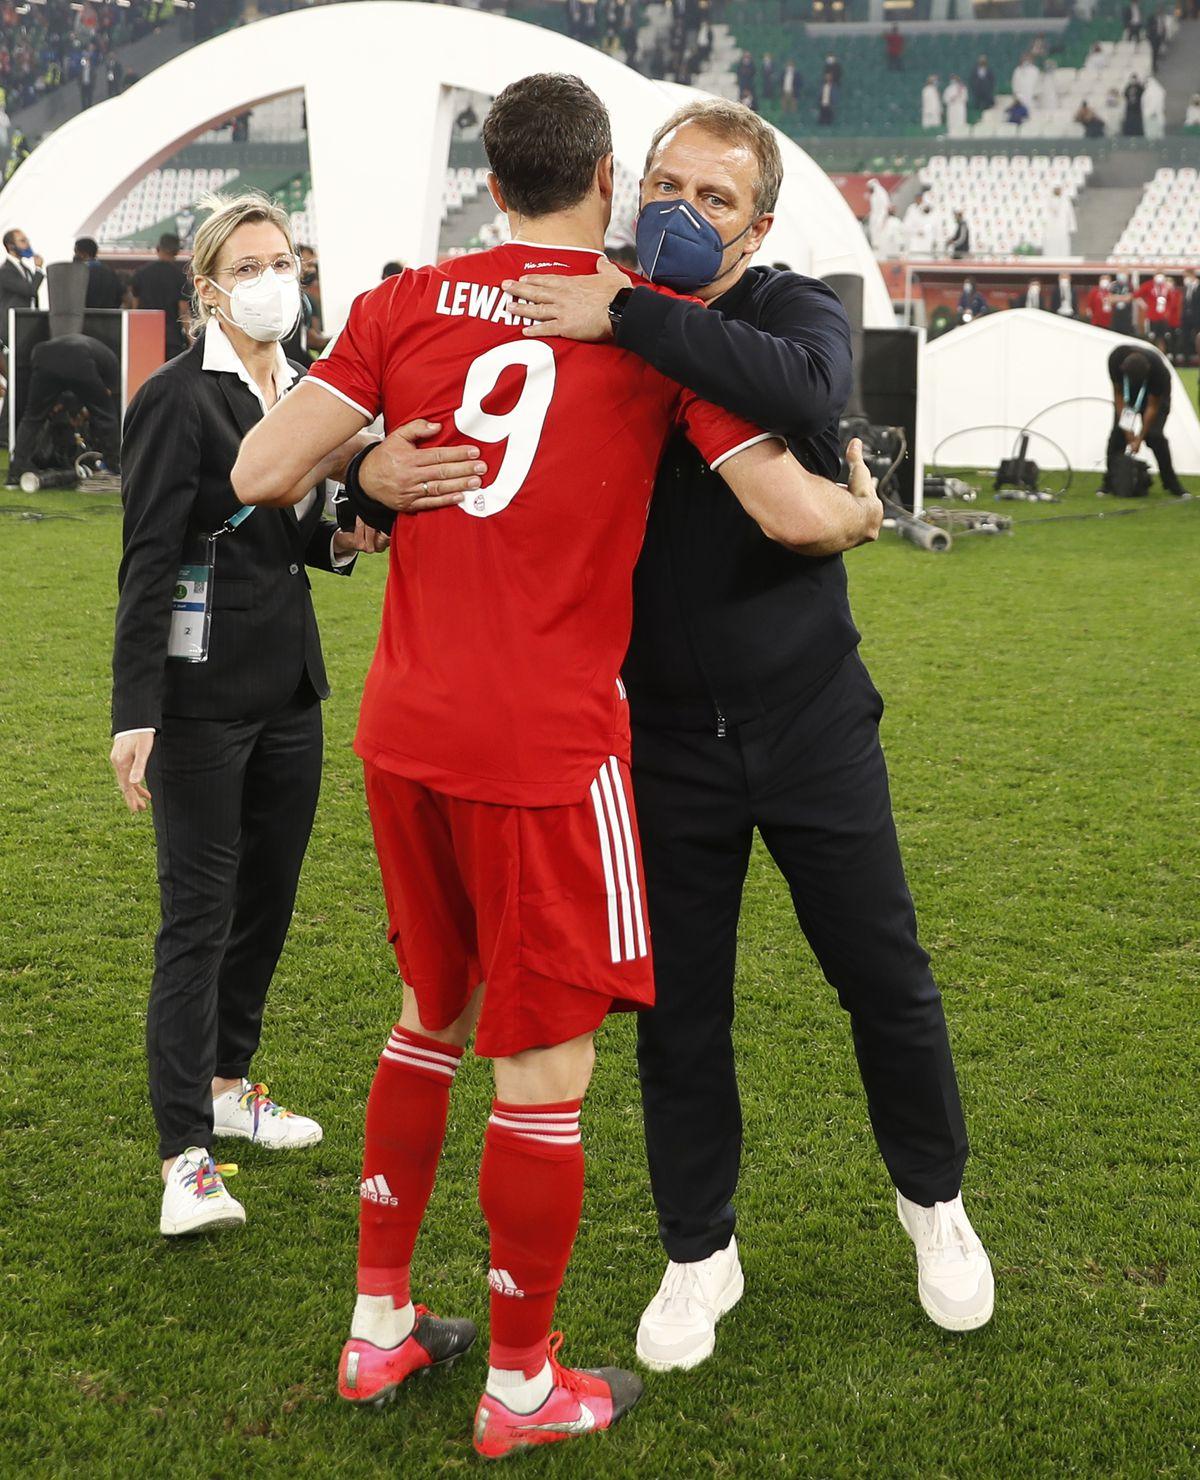 FC Bayern München v Tigres UANL - Copa Mundial de Clubes de la FIFA Catar 2020